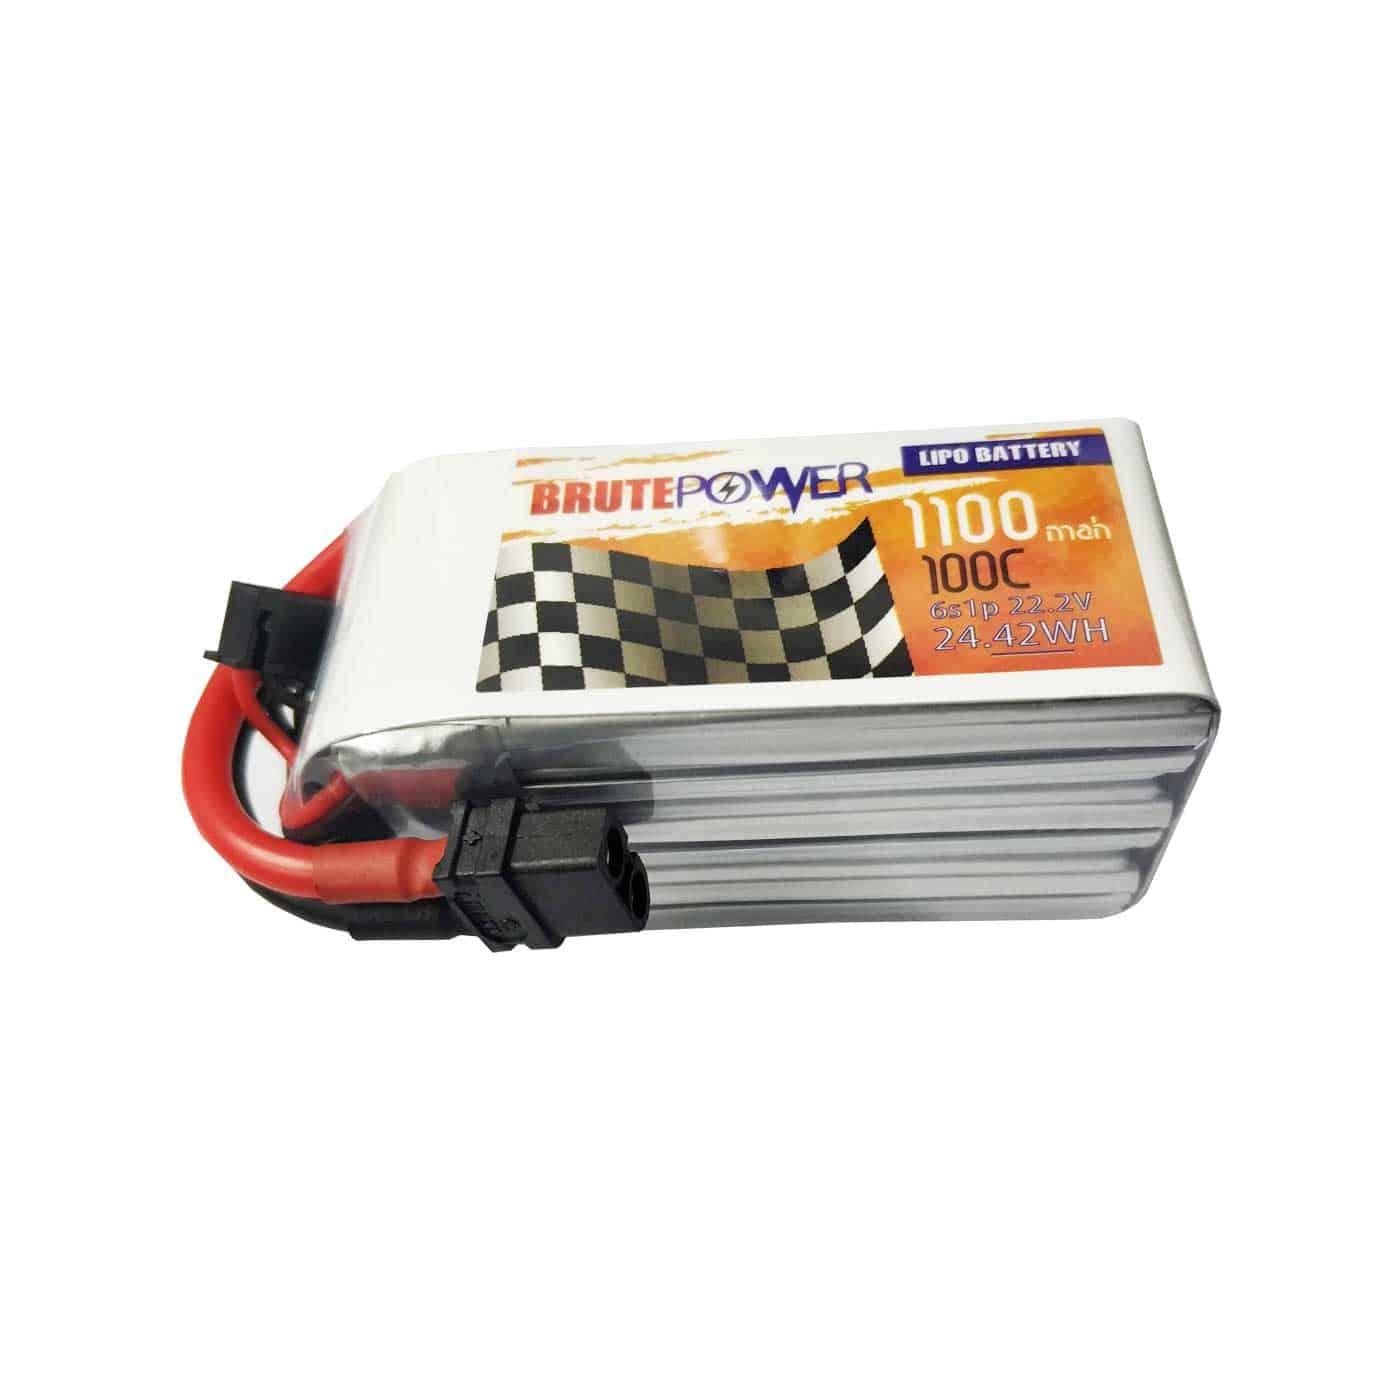 Batería Lipo Brutepower 6s 1100mah 100C